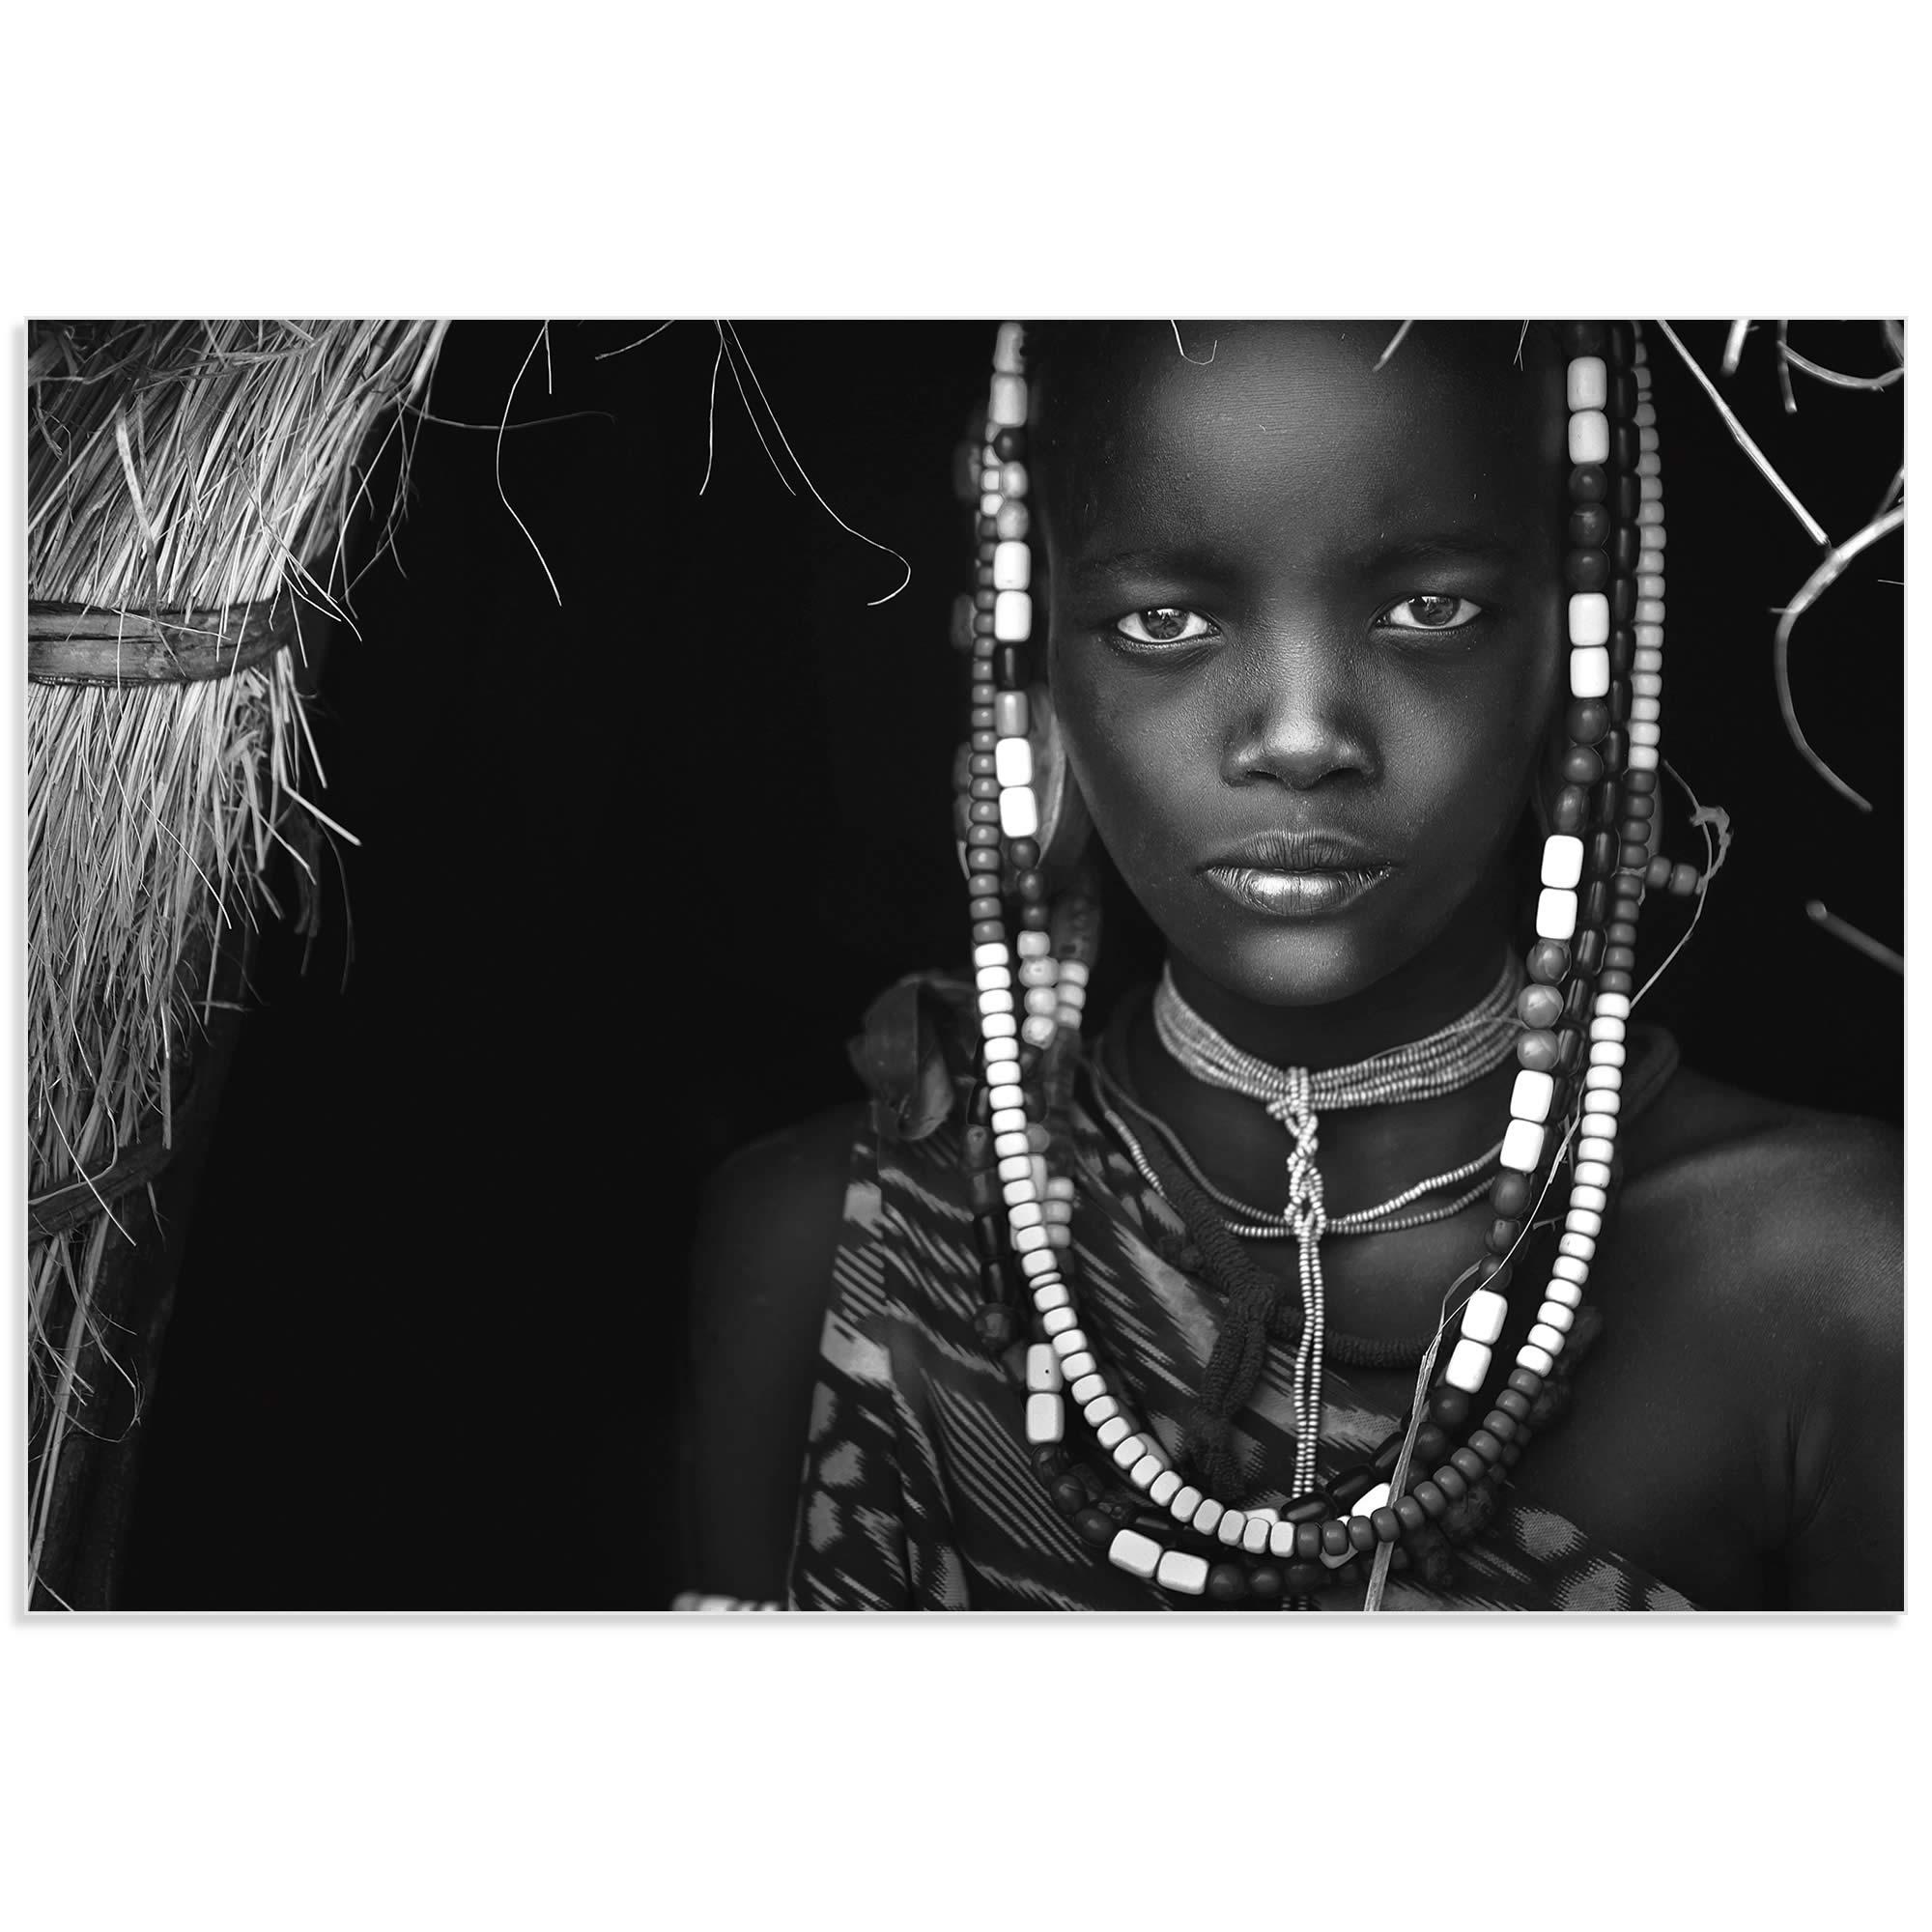 Mursi Girl by Hesham Alhumaid - African Fashion Art on Metal or Acrylic - Alternate View 2